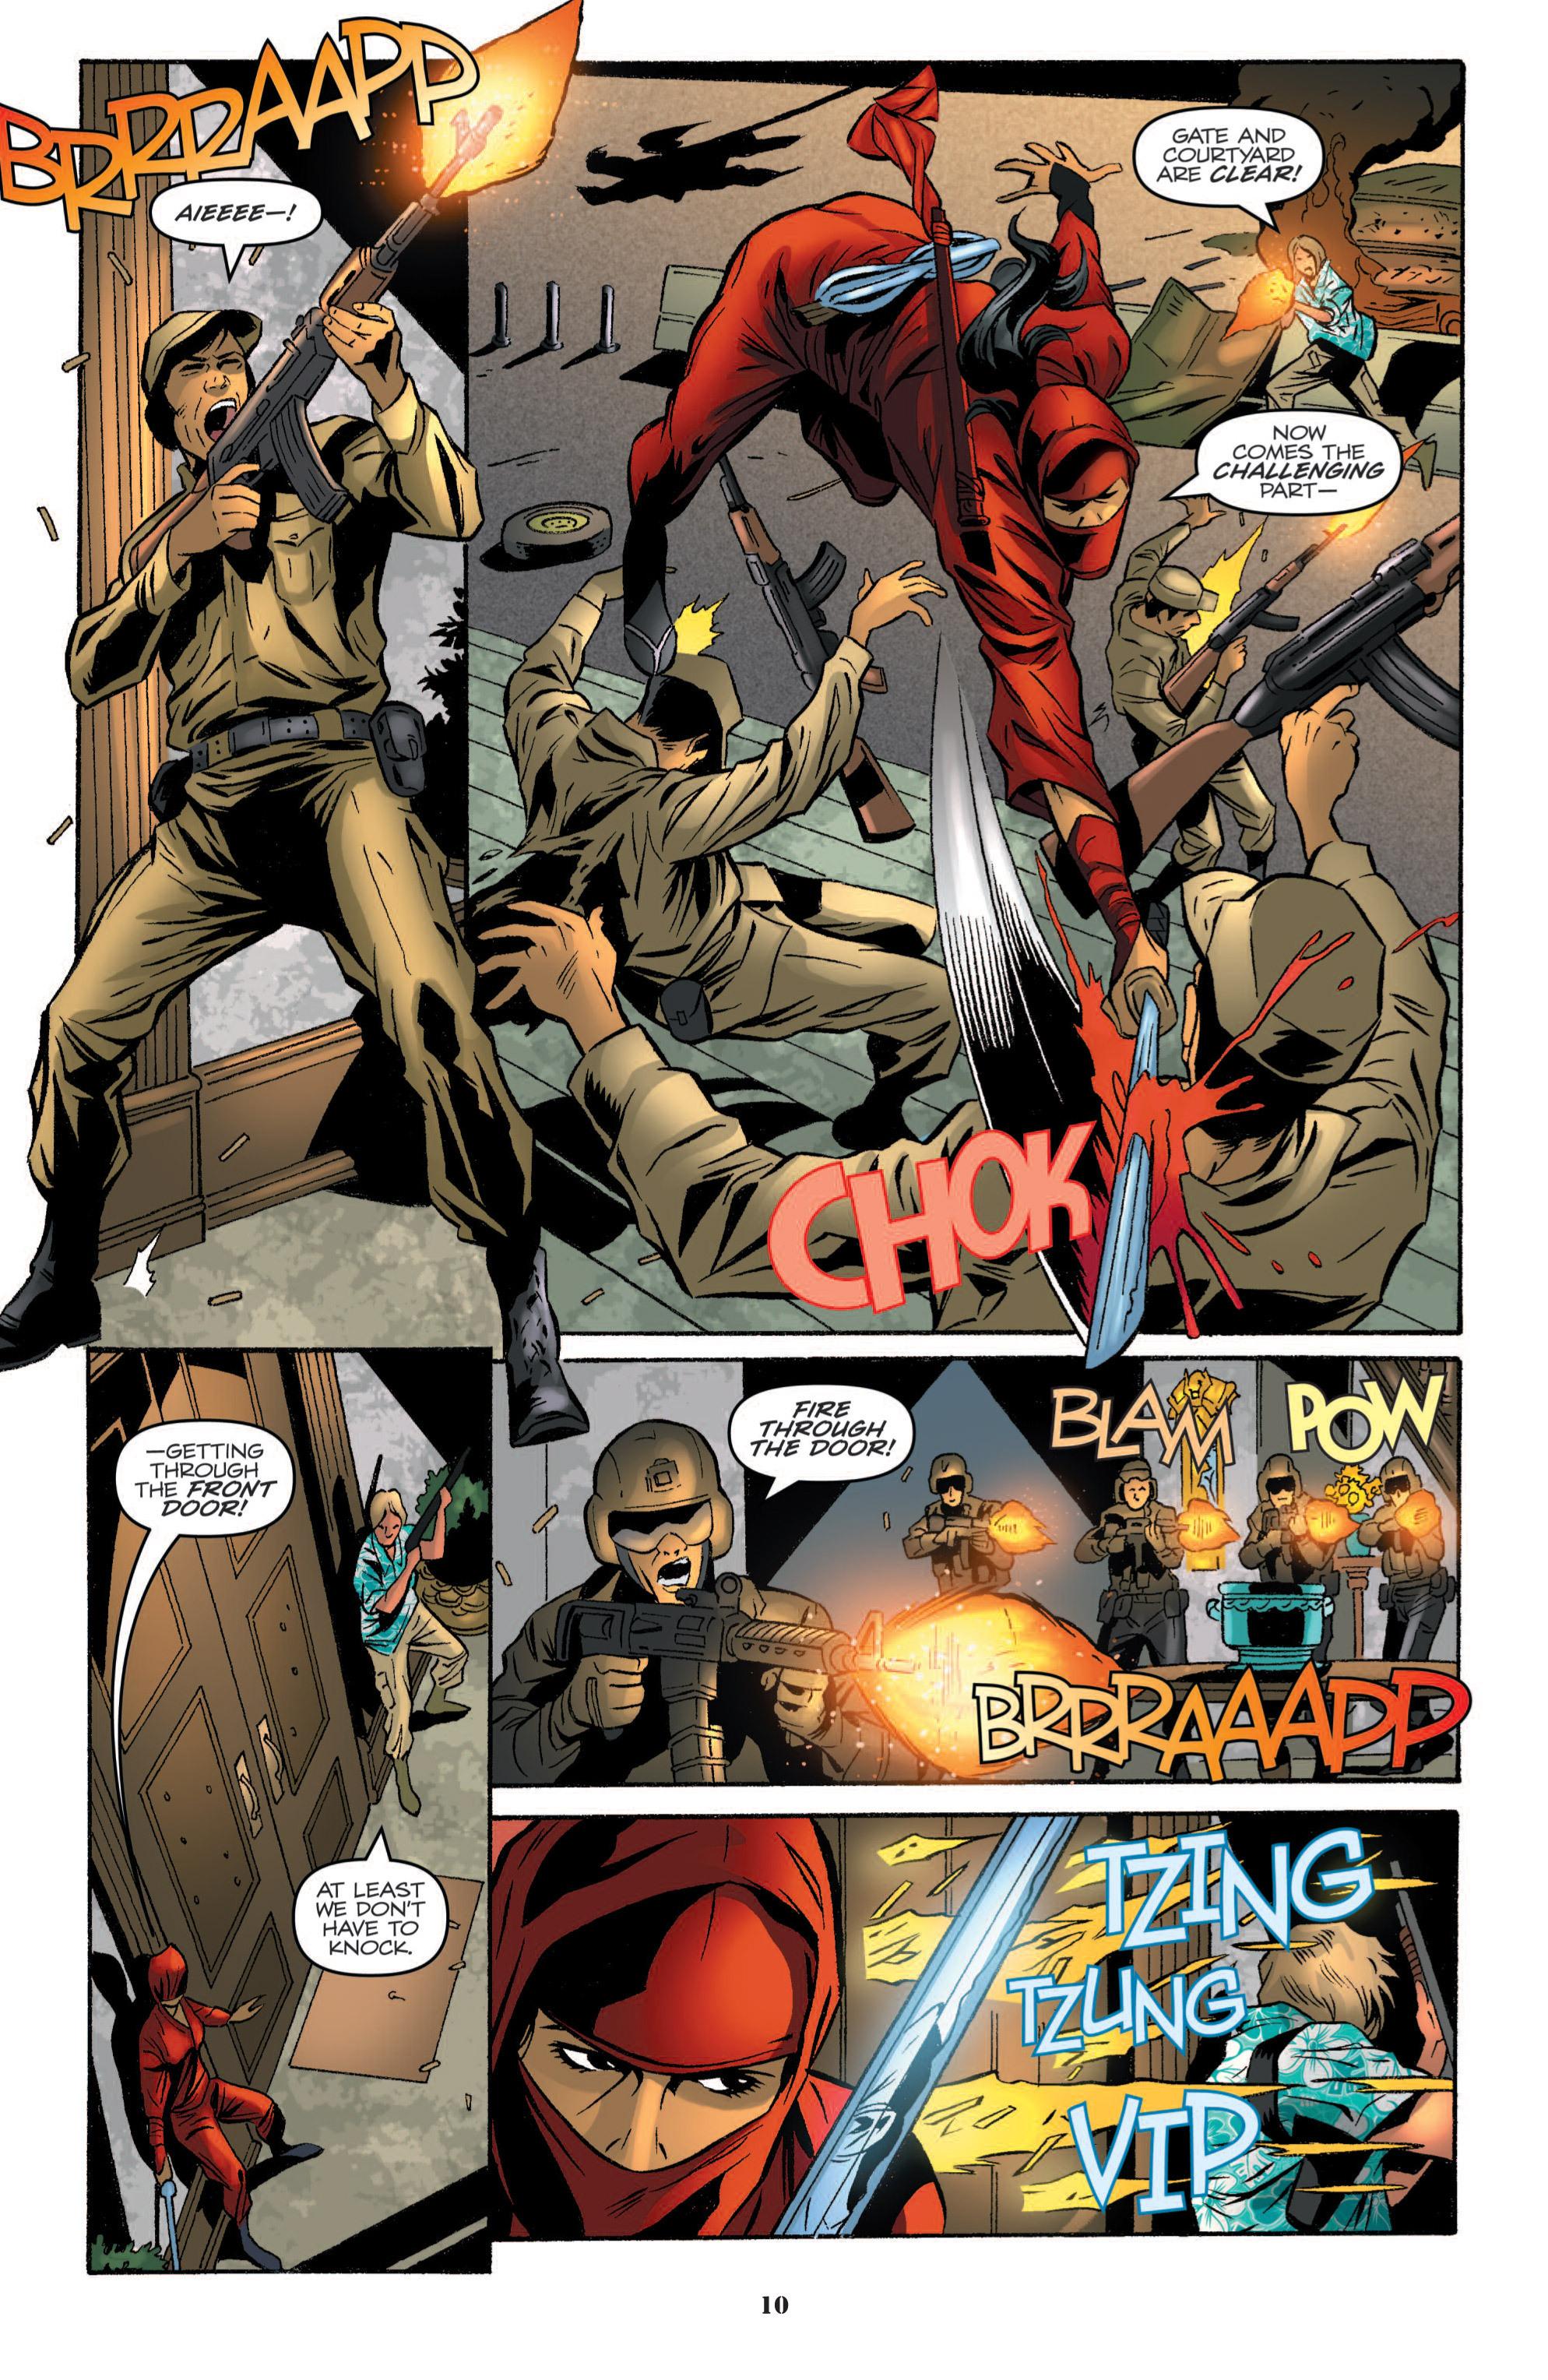 G.I. Joe: A Real American Hero 191 Page 11